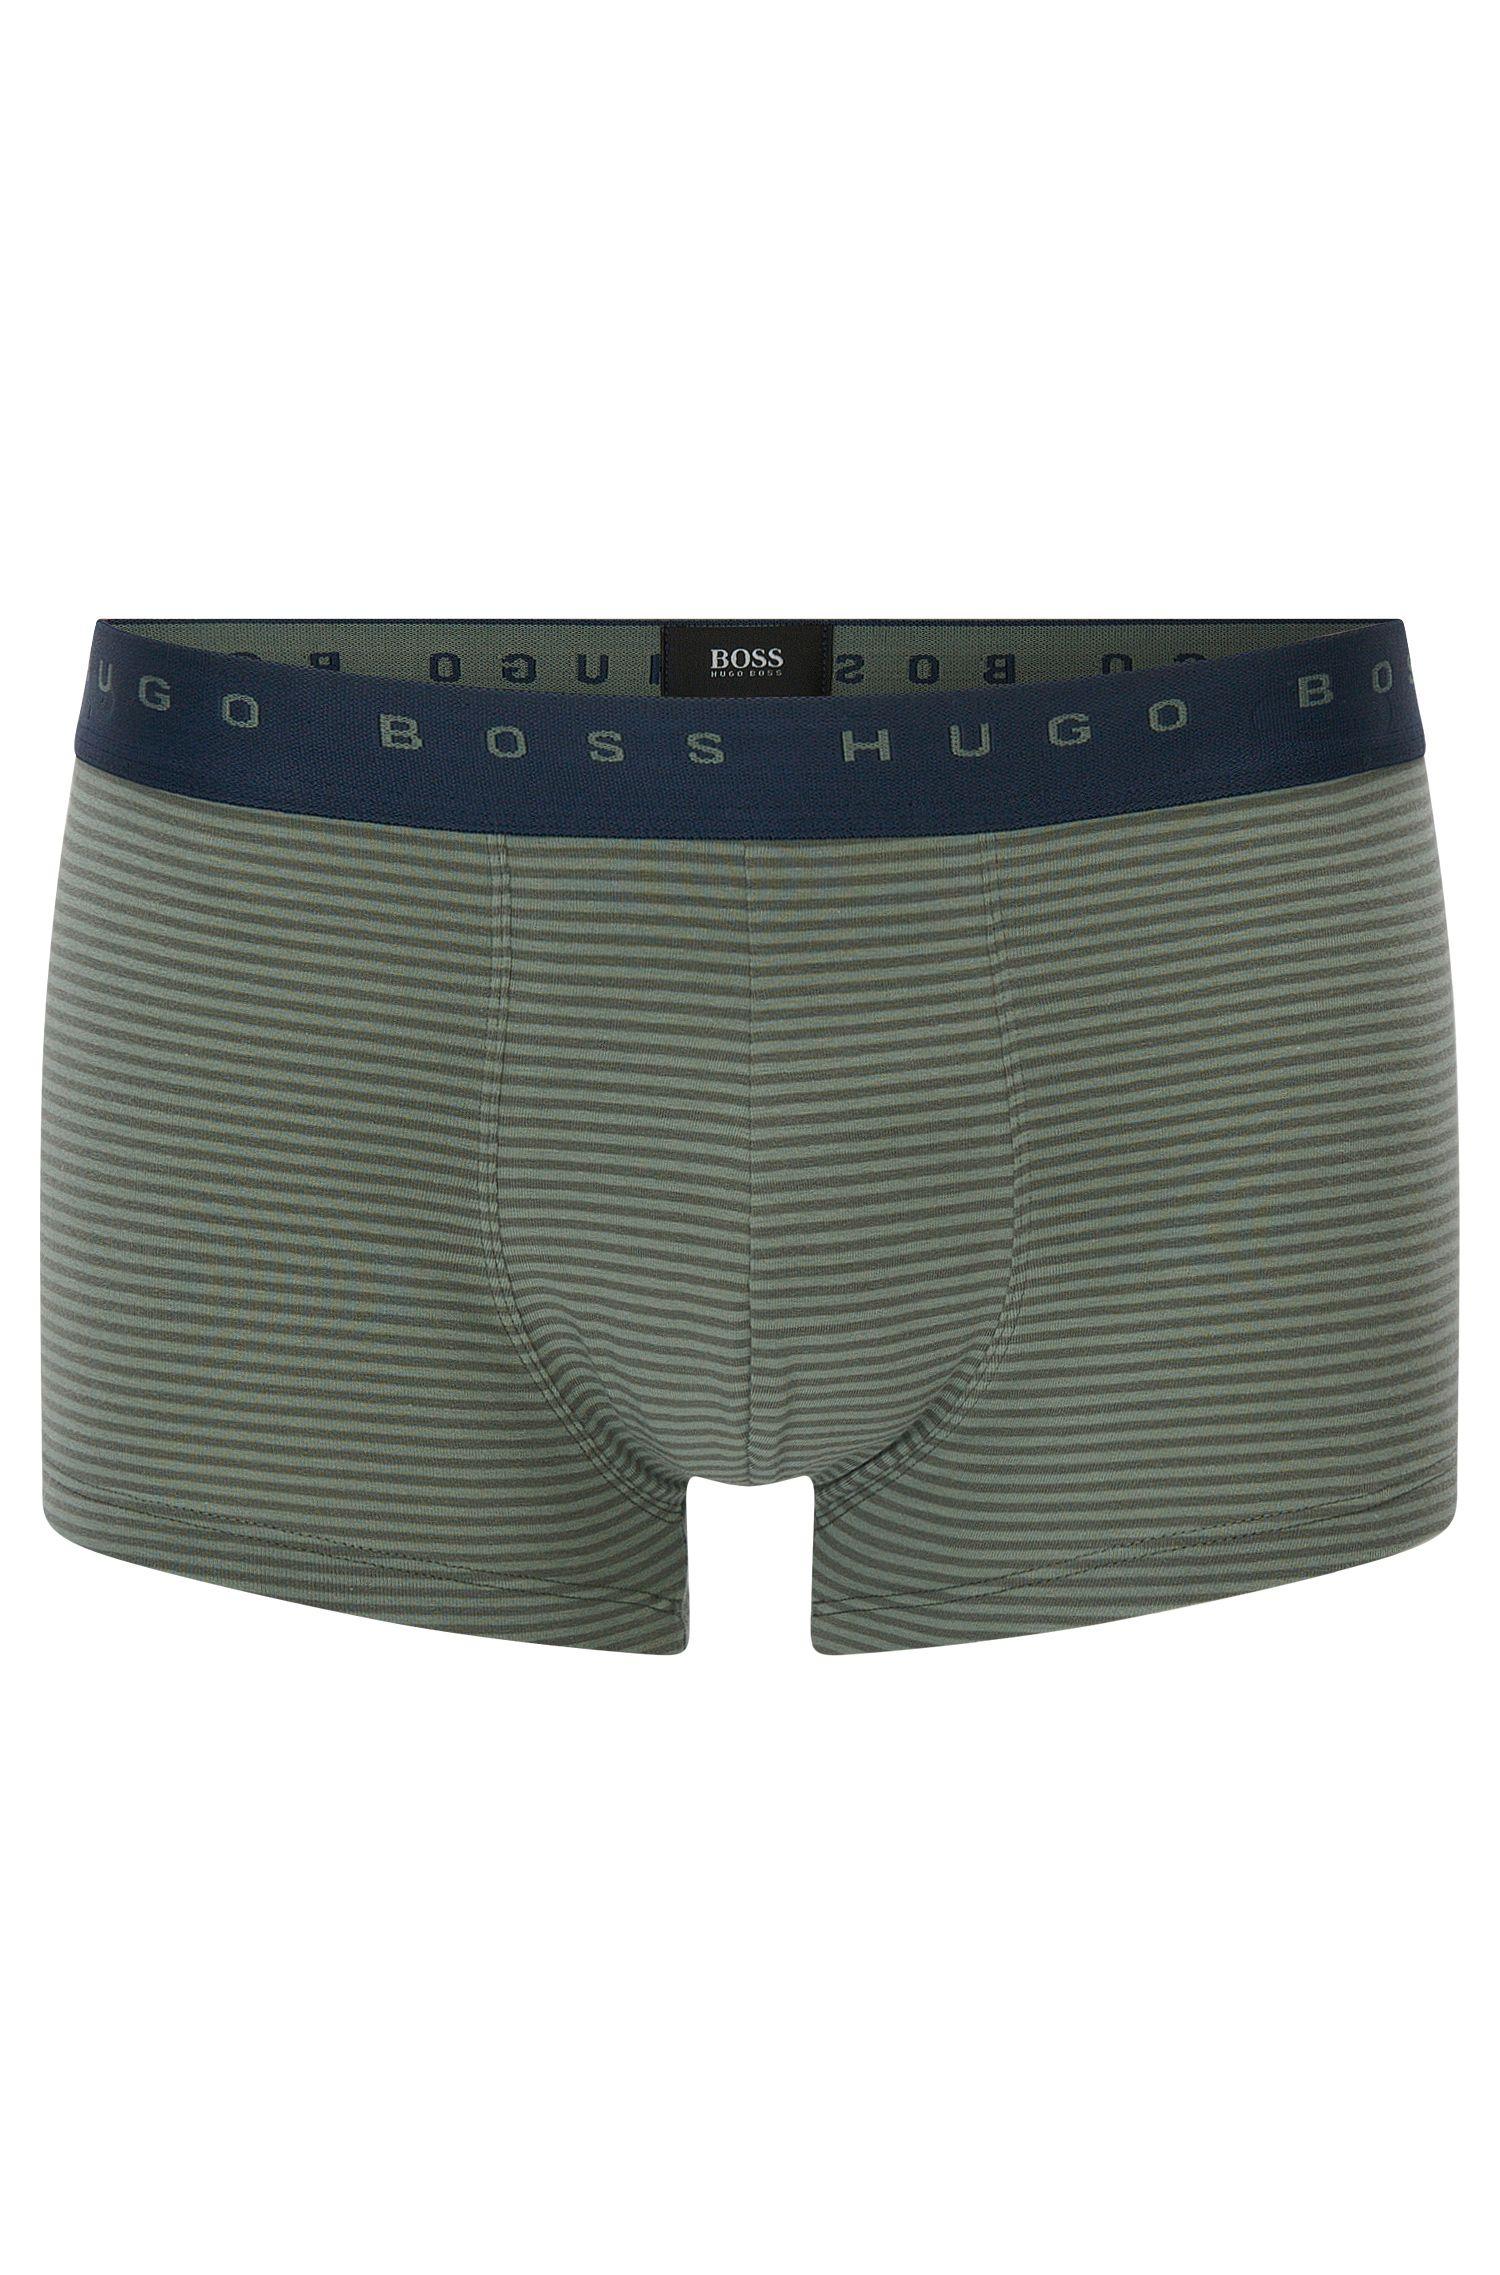 Striped boxer shorts in stretch cotton: 'Trunk Finestripe'